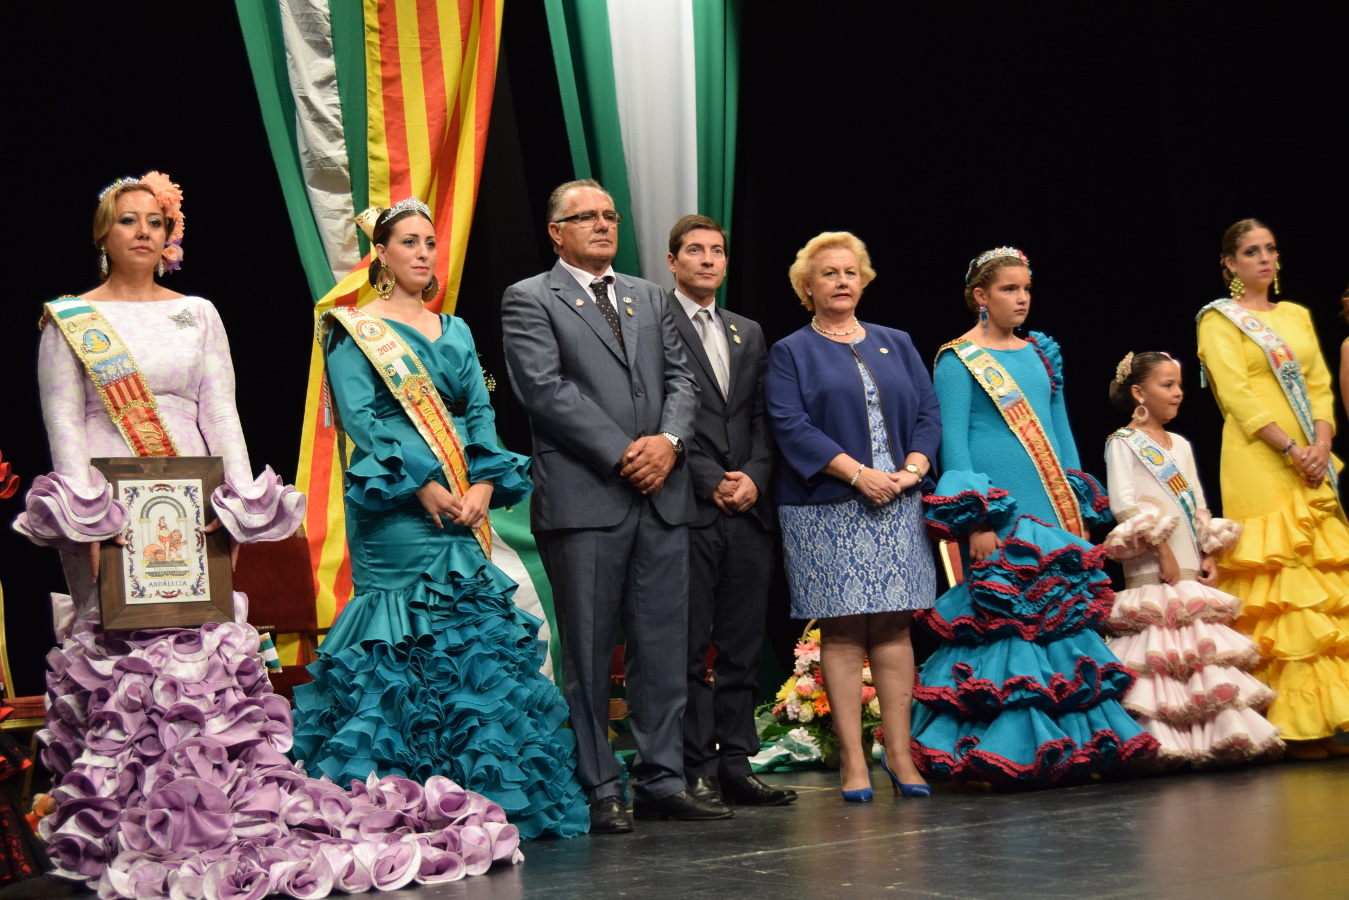 La asociación andaluza de Burjassot corona a sus reinas